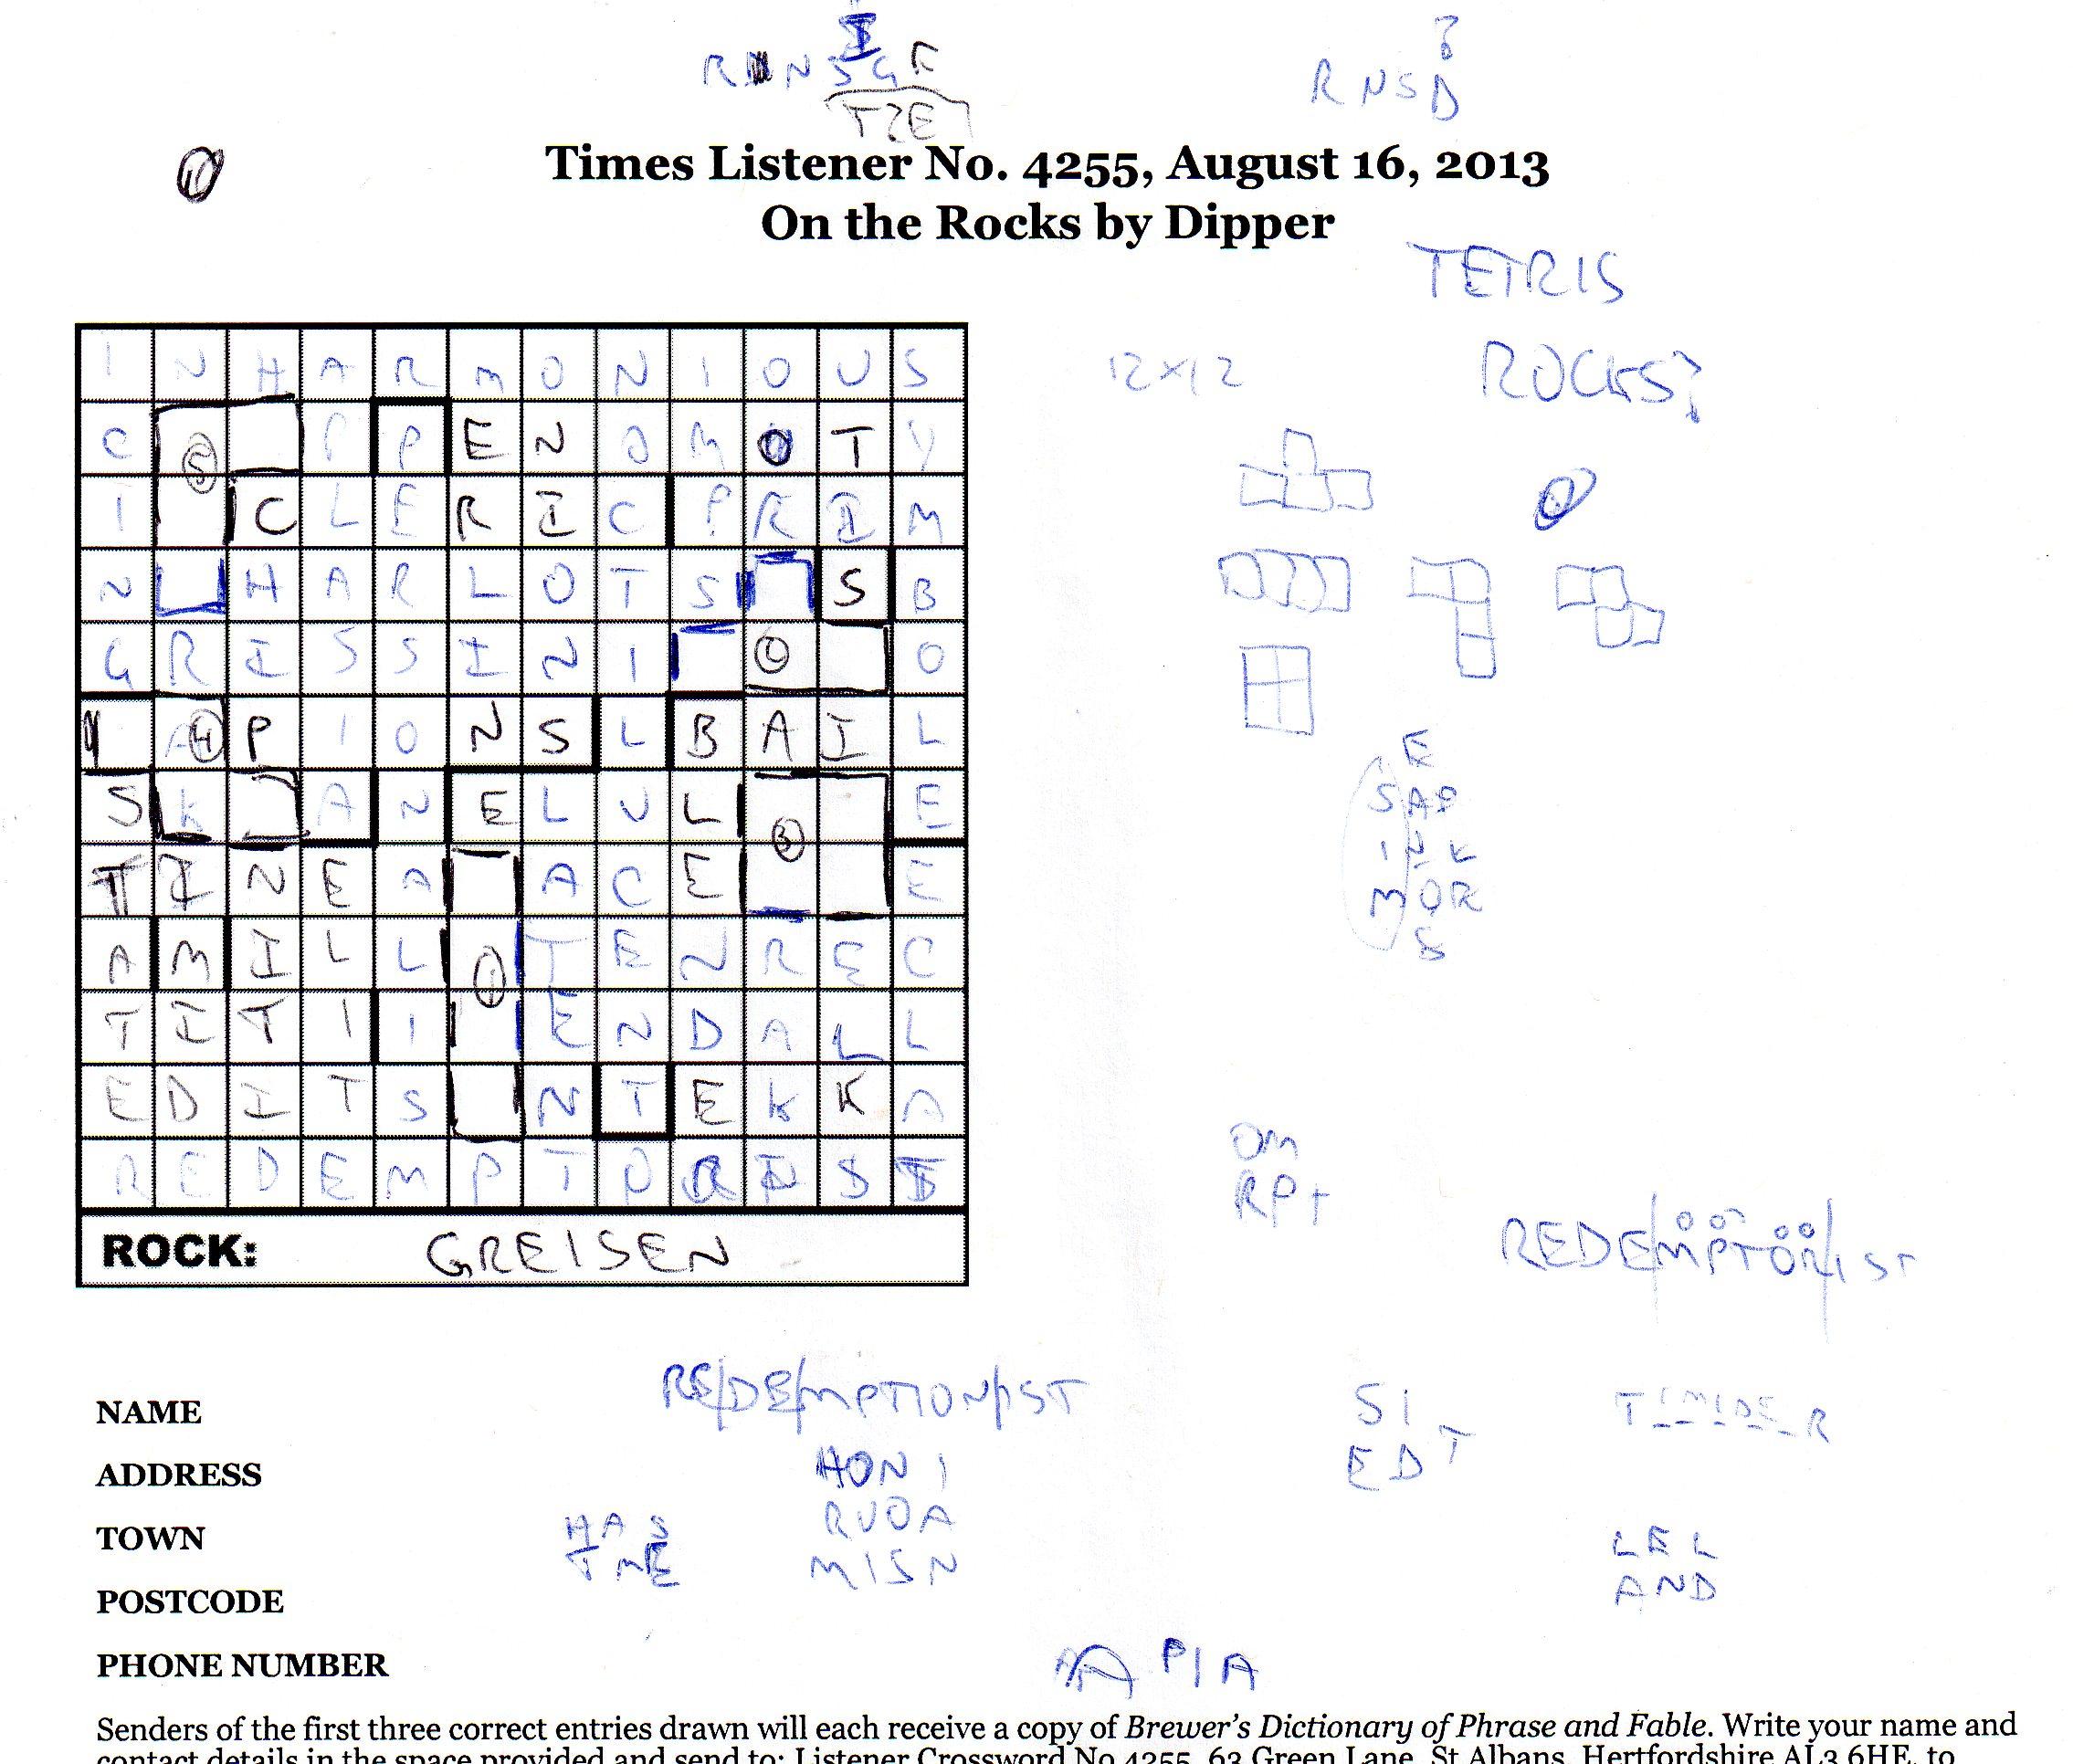 003 Name In Essays Crossword Clue Listener4256 Essay Excellent Full